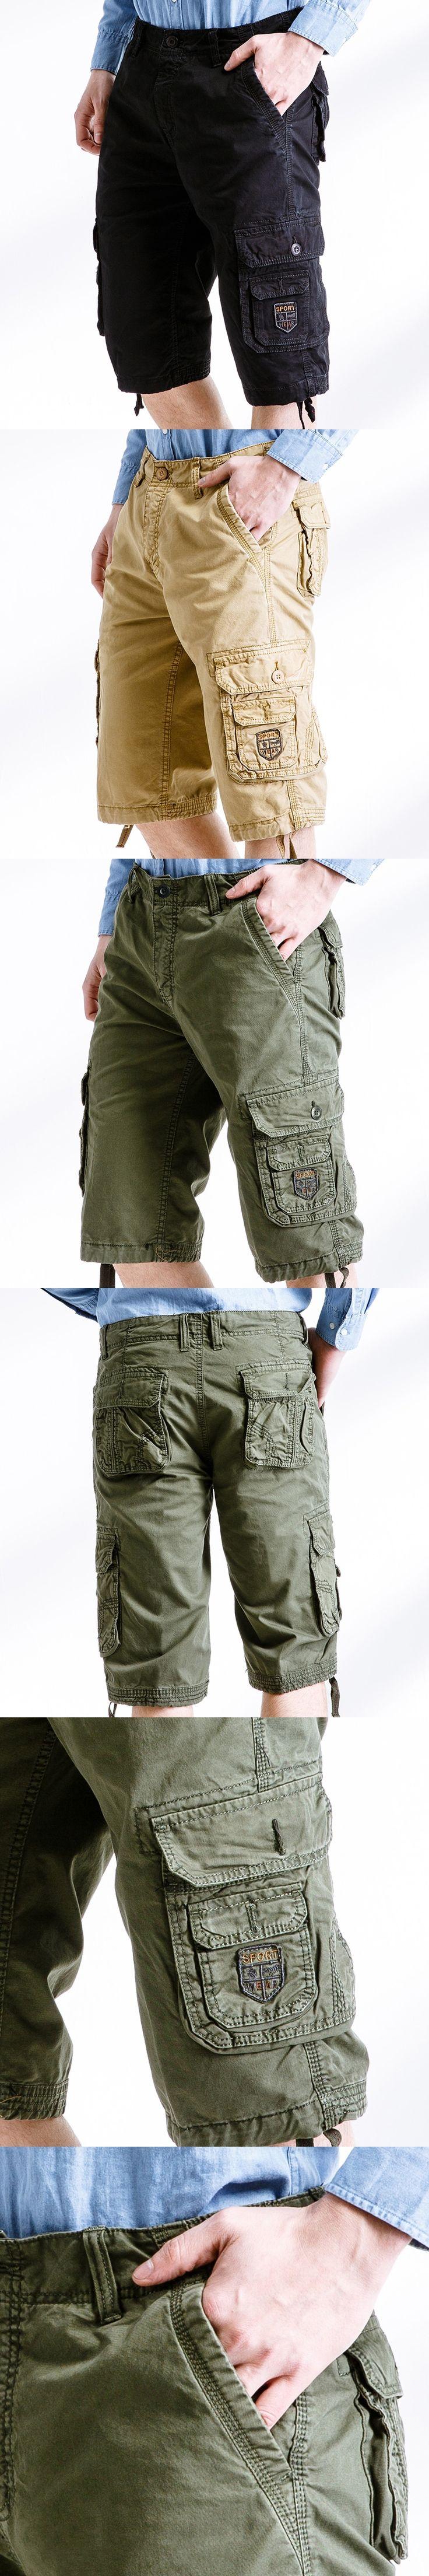 2017 Mens Leisure Cargo Pants Solid Cotton Knee Length Loose Comfortable Jogger Trousers Summer Short for Male pantalon hombre